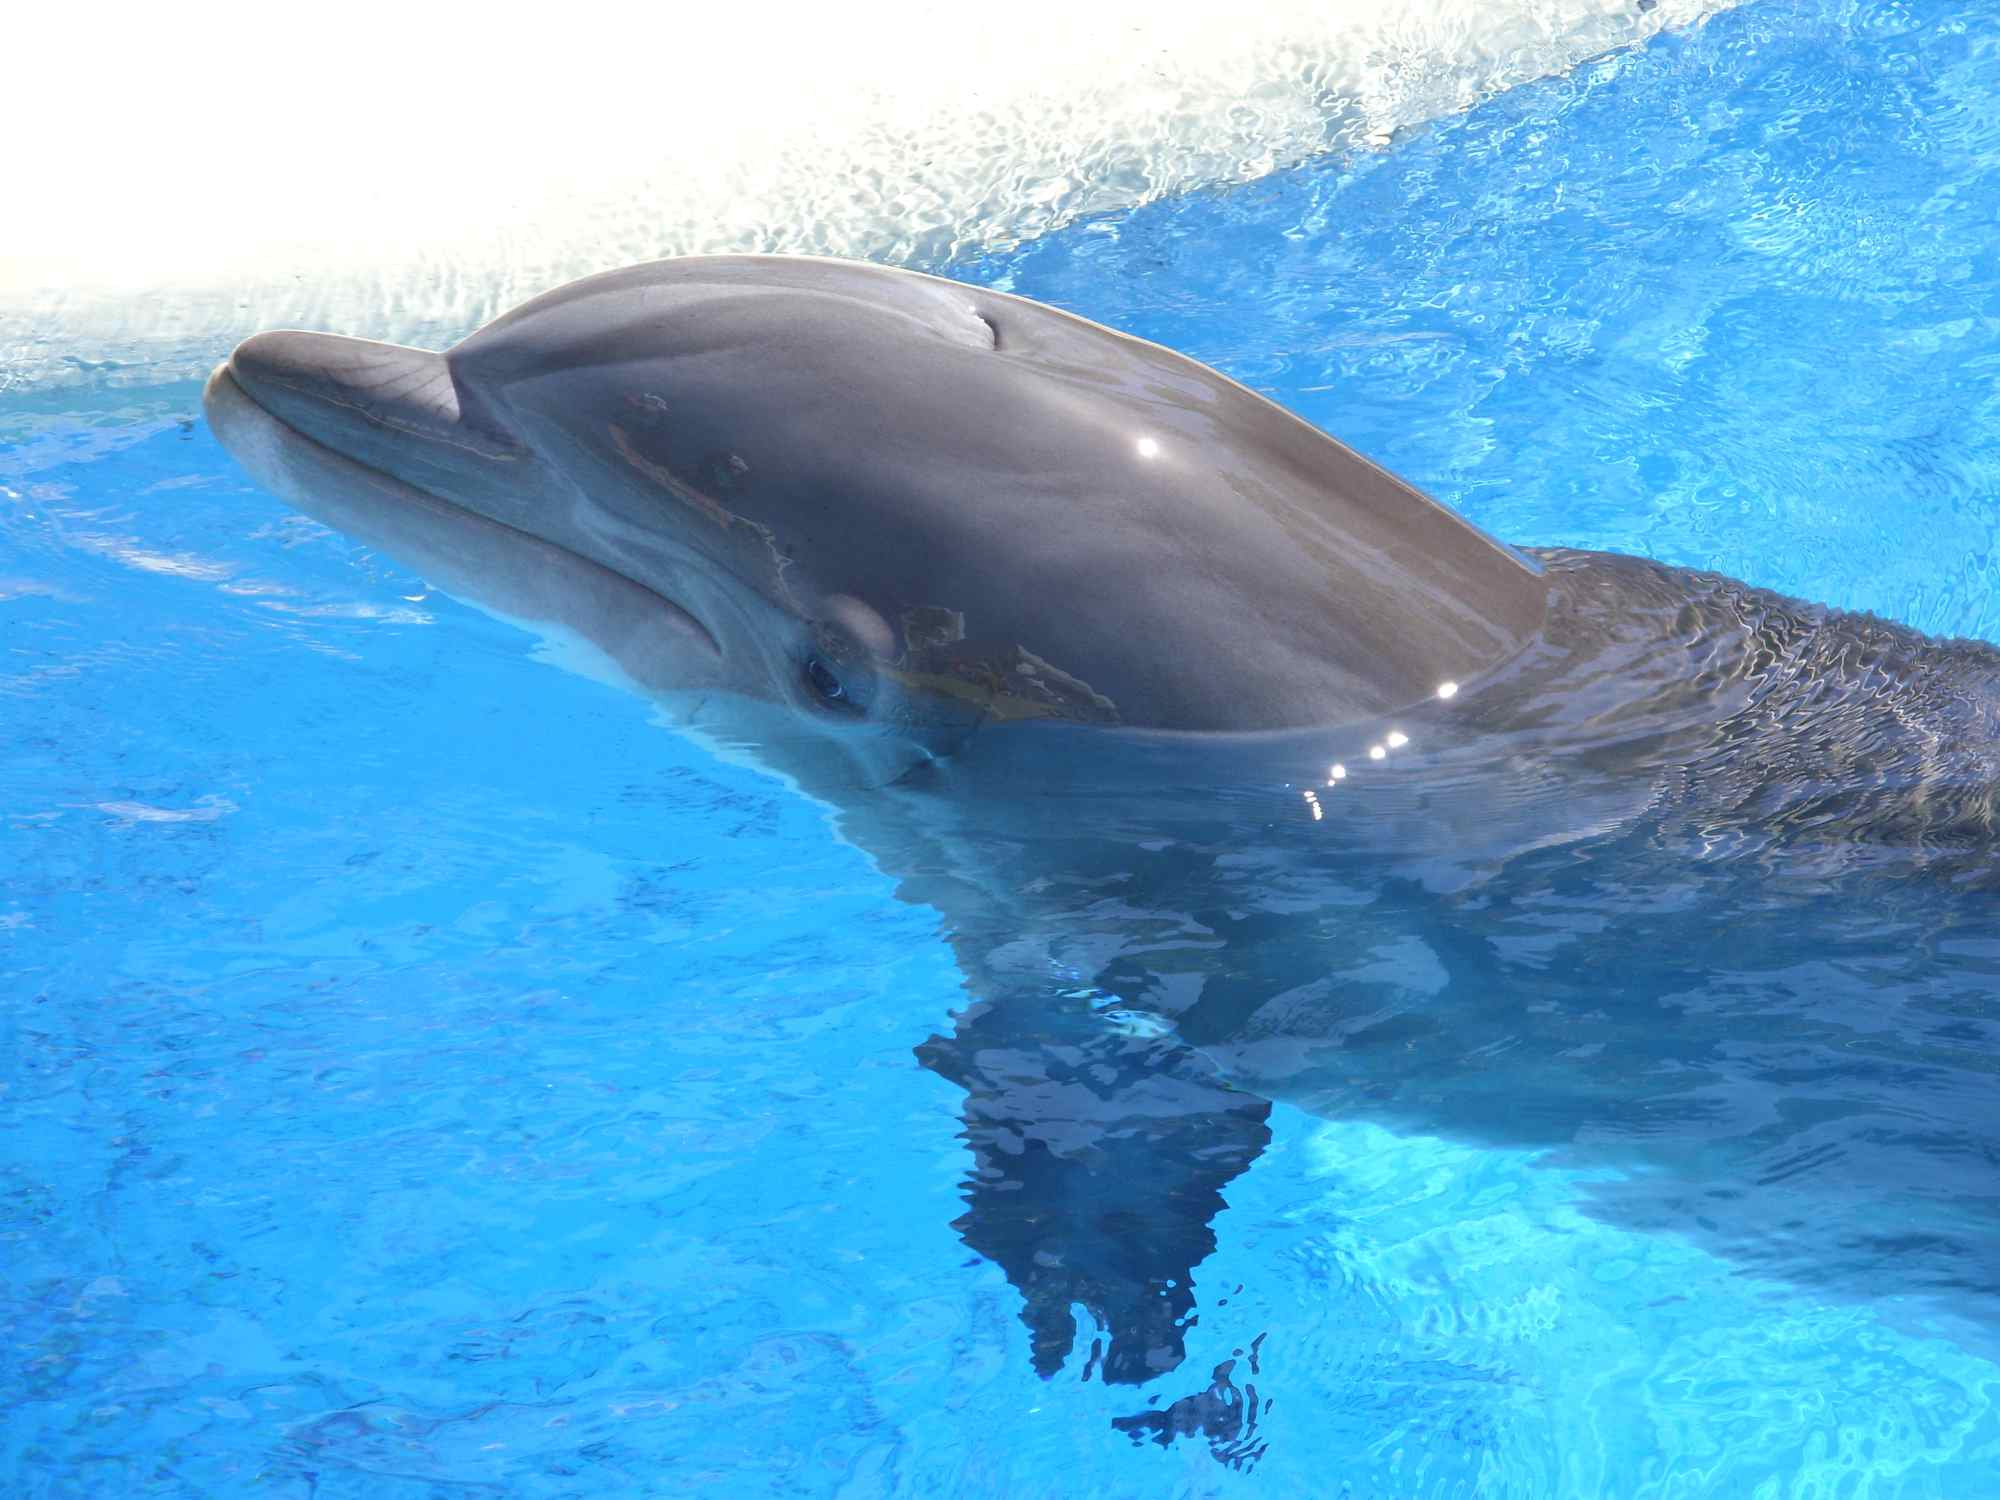 Dolphin at The Mirage, Las Vegas